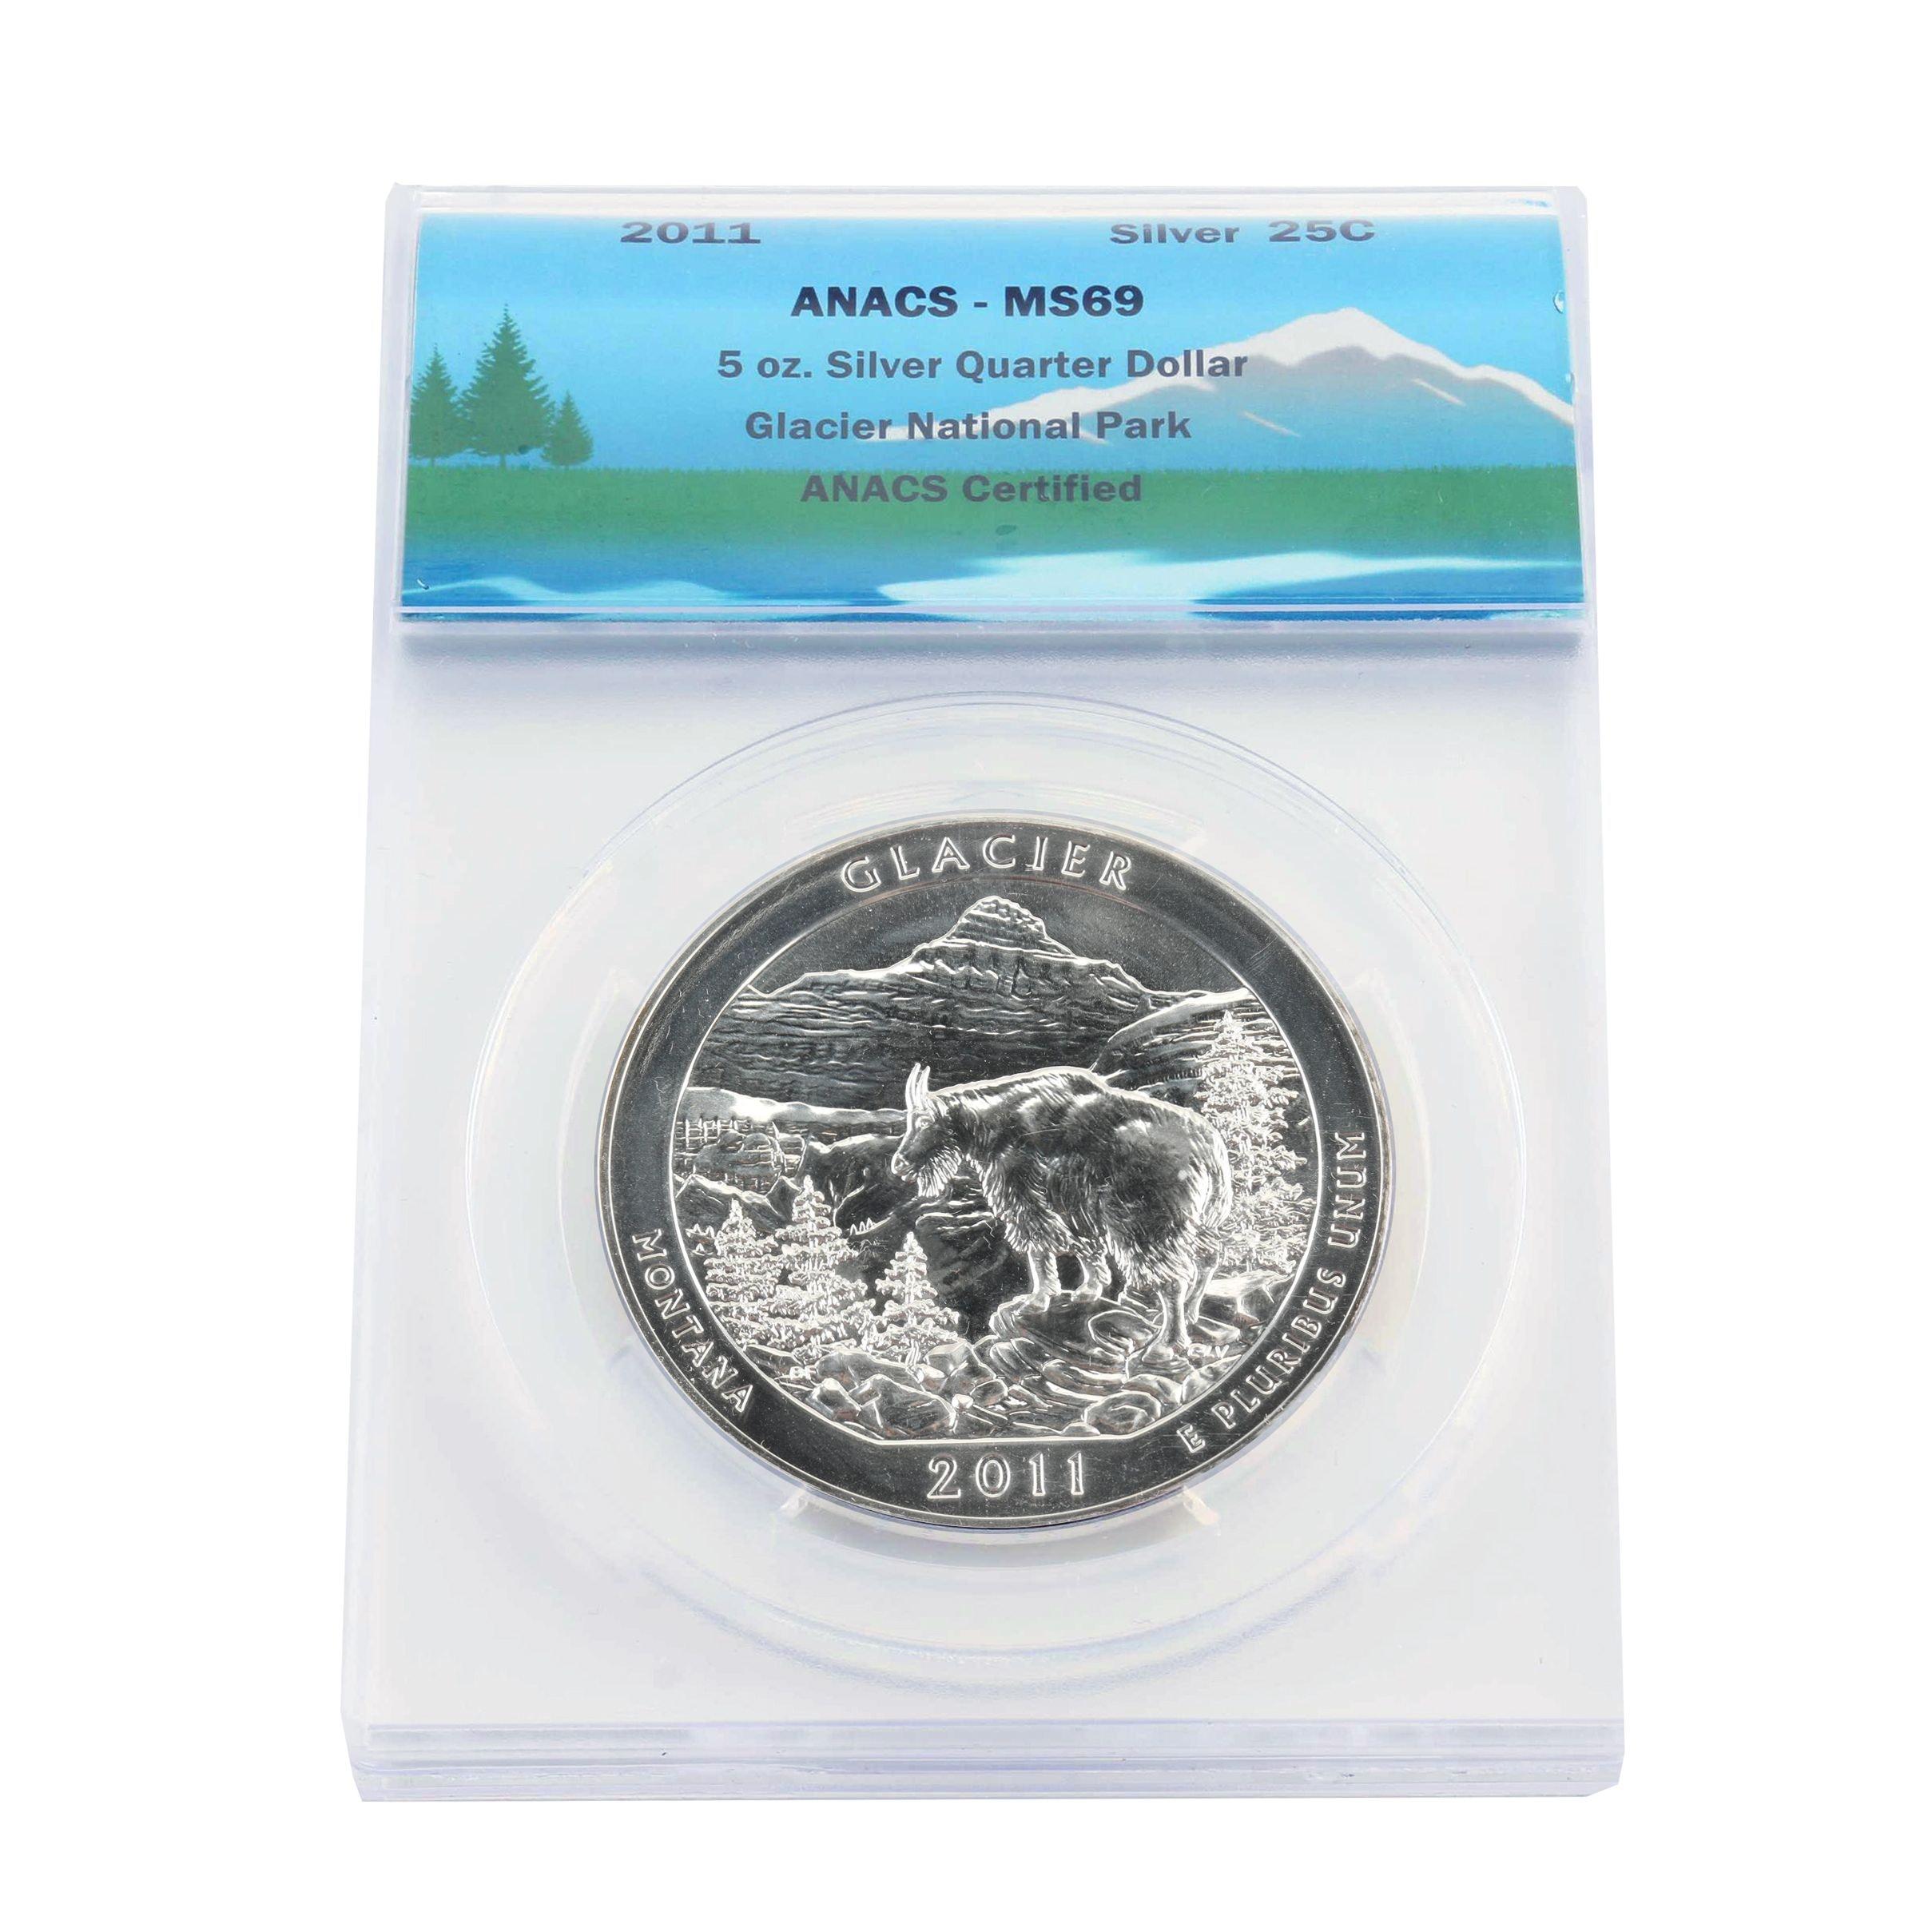 ANACS Graded MS69 5 Oz. Glacier National Park Silver Bullion Coin